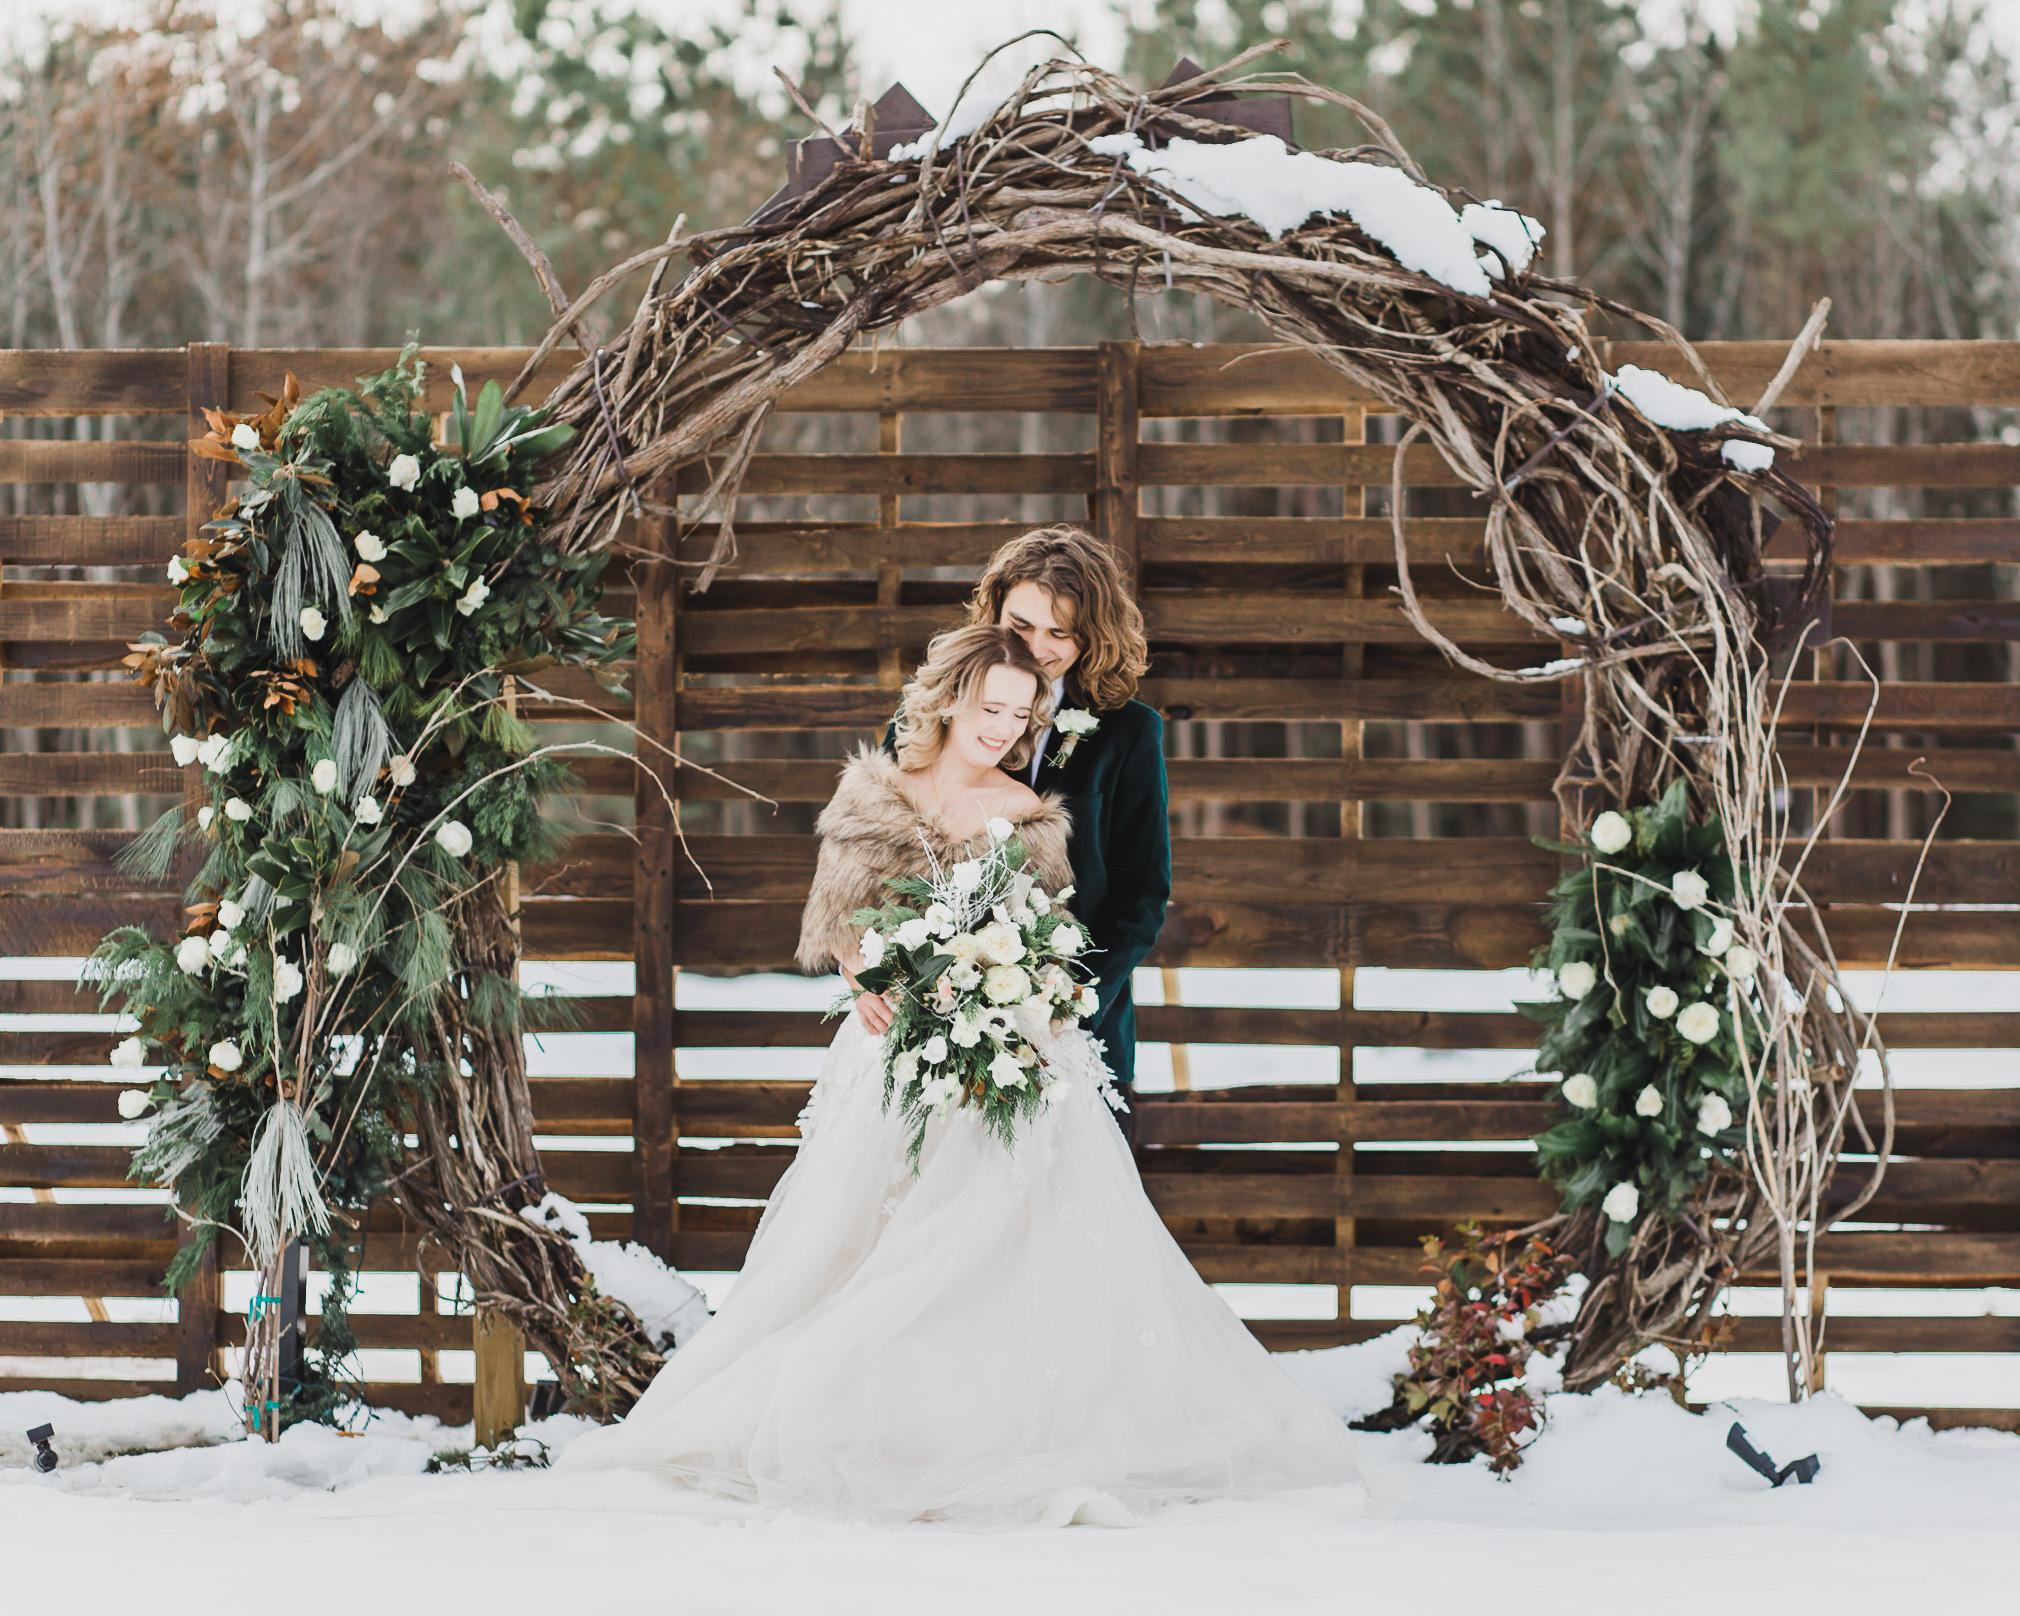 Winter Wedding Styled Shoot201812125947.jpg